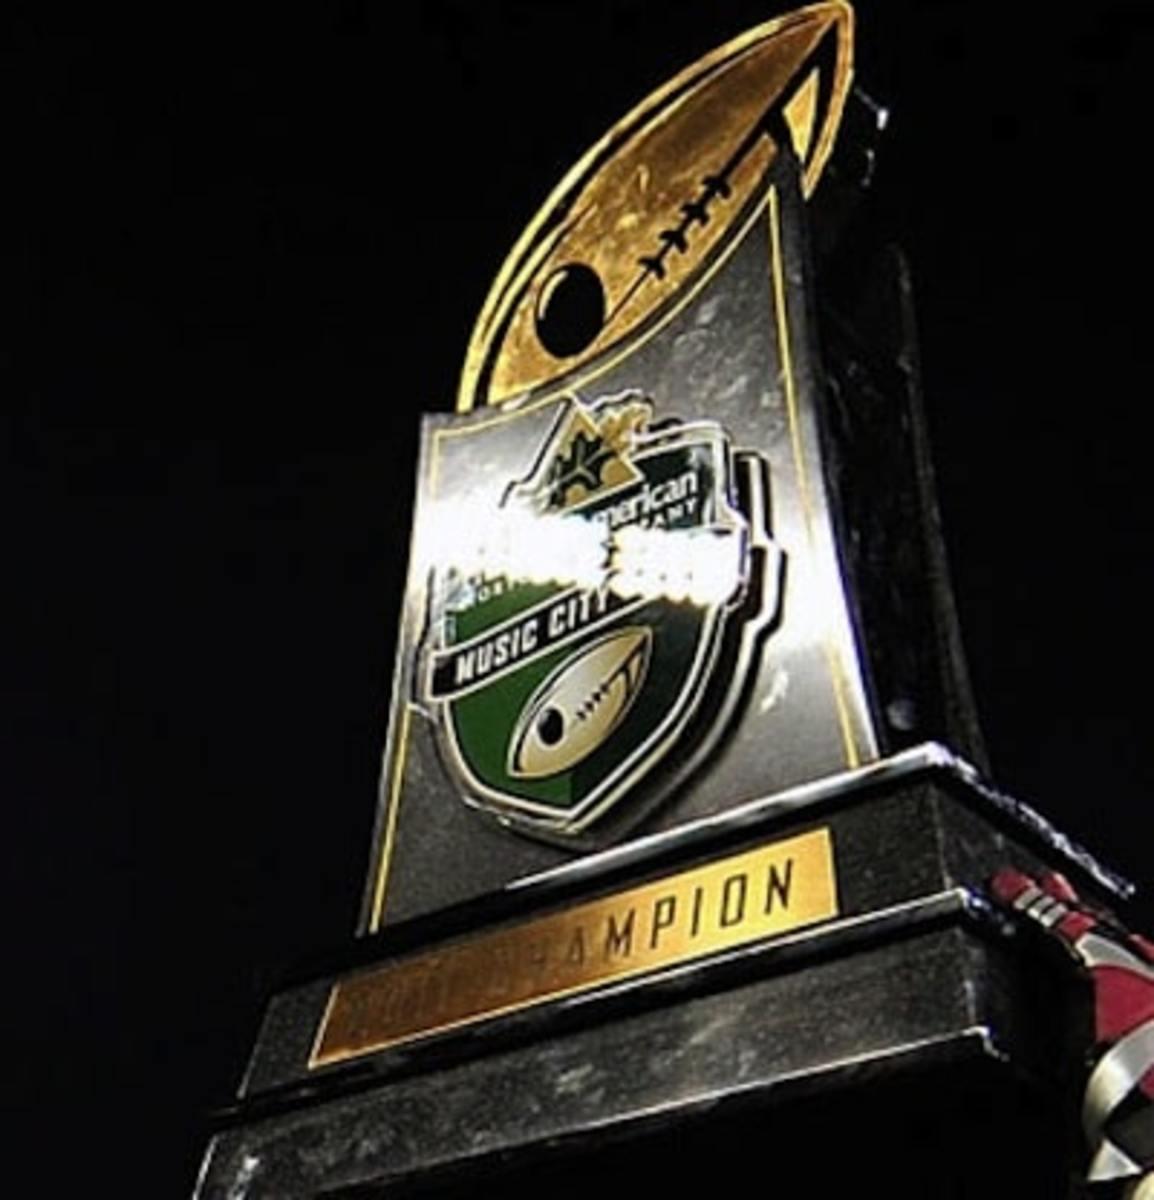 Music City Bowl trophy2